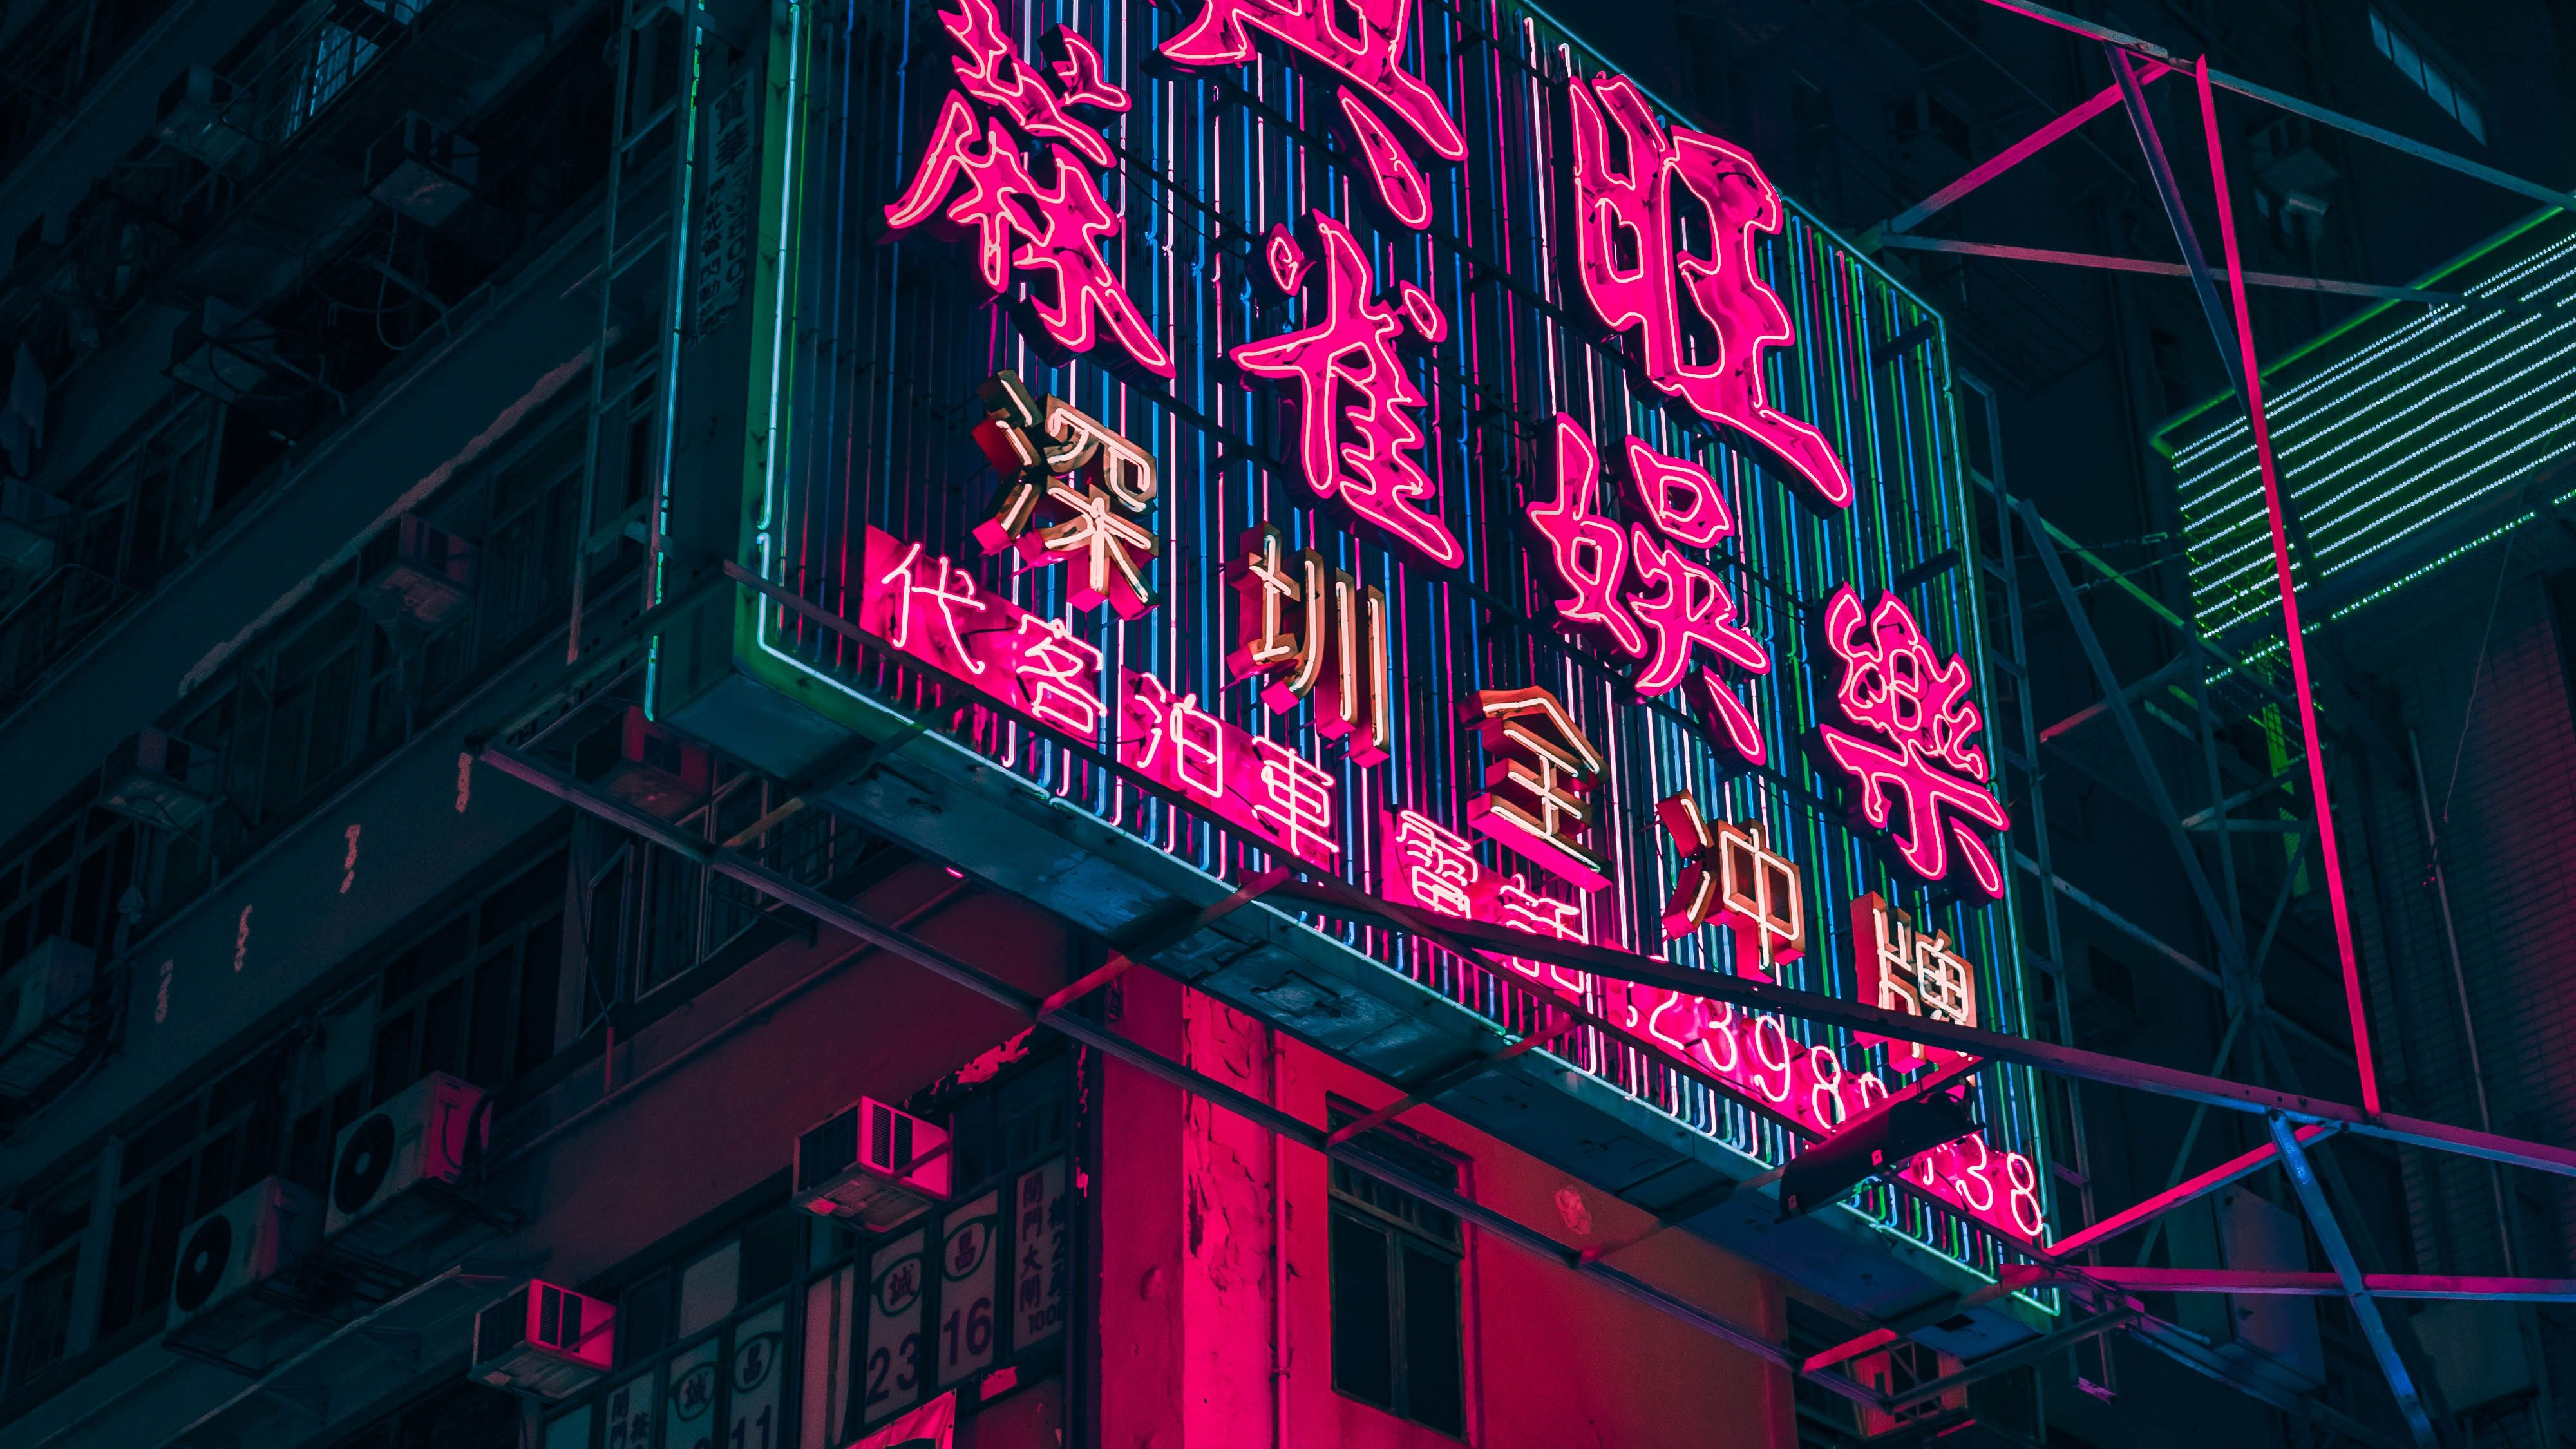 Wallpaper For Laptop Neon